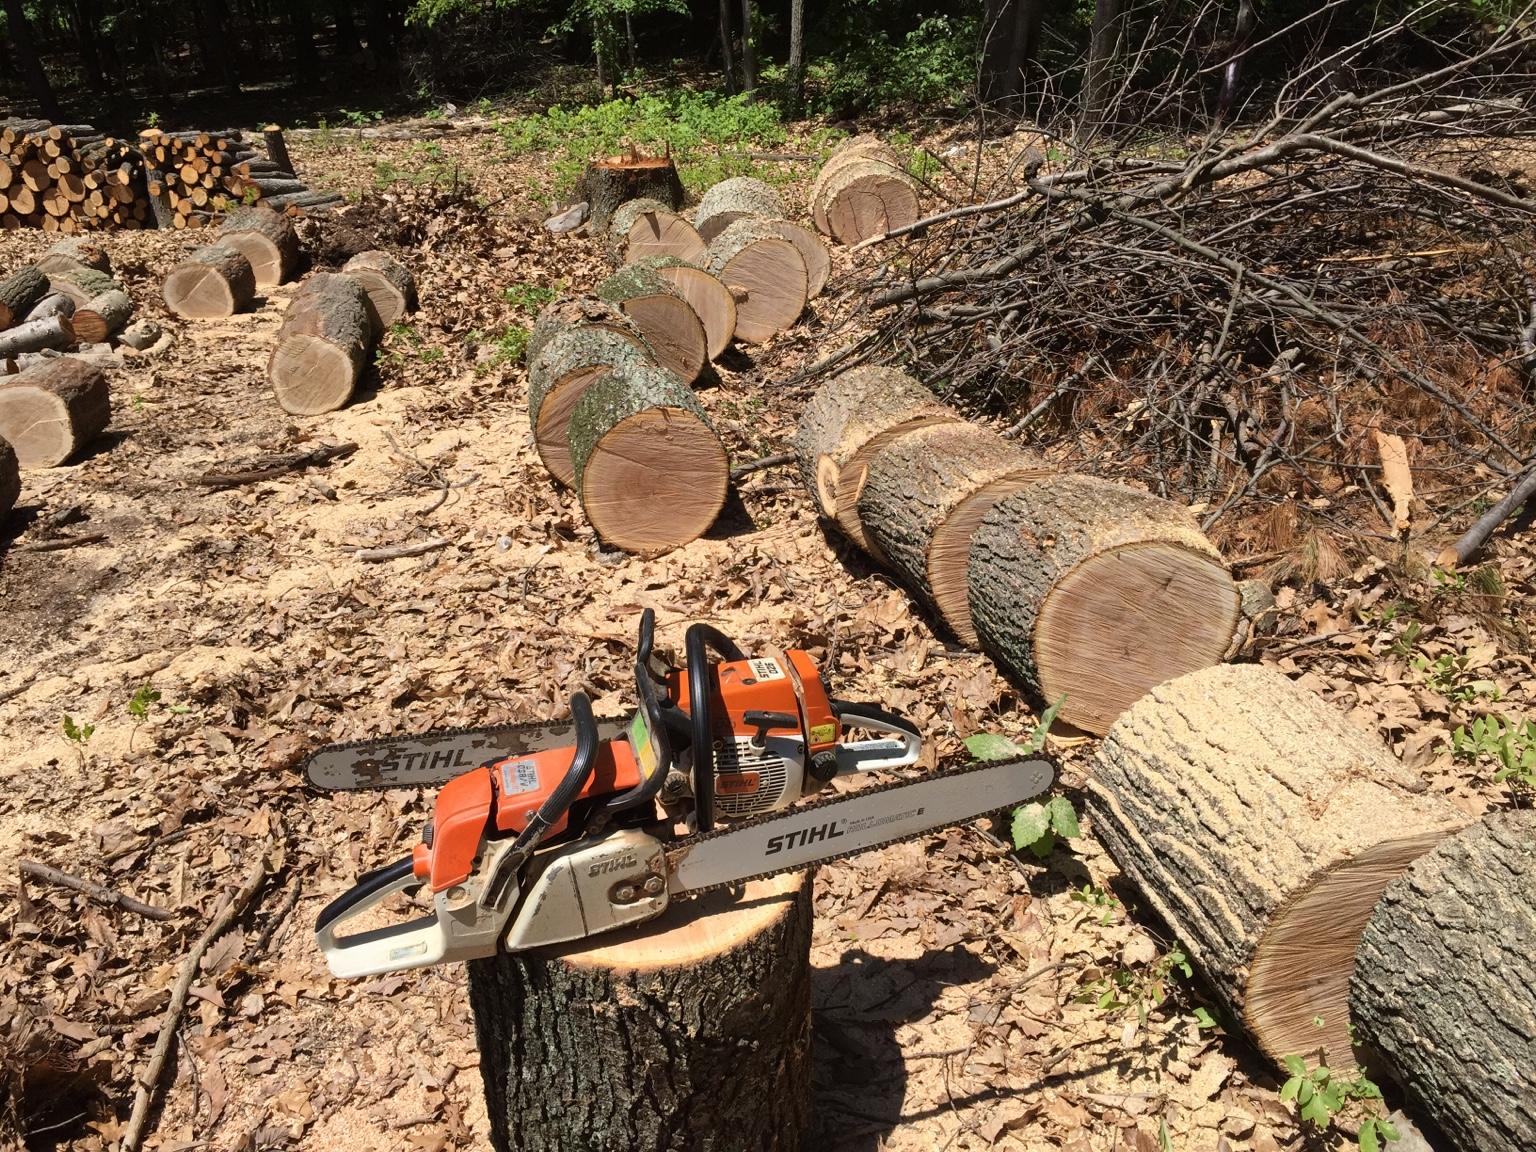 Echo husqvarna or stihl chainsaw - Comparatif tronconneuse stihl husqvarna ...